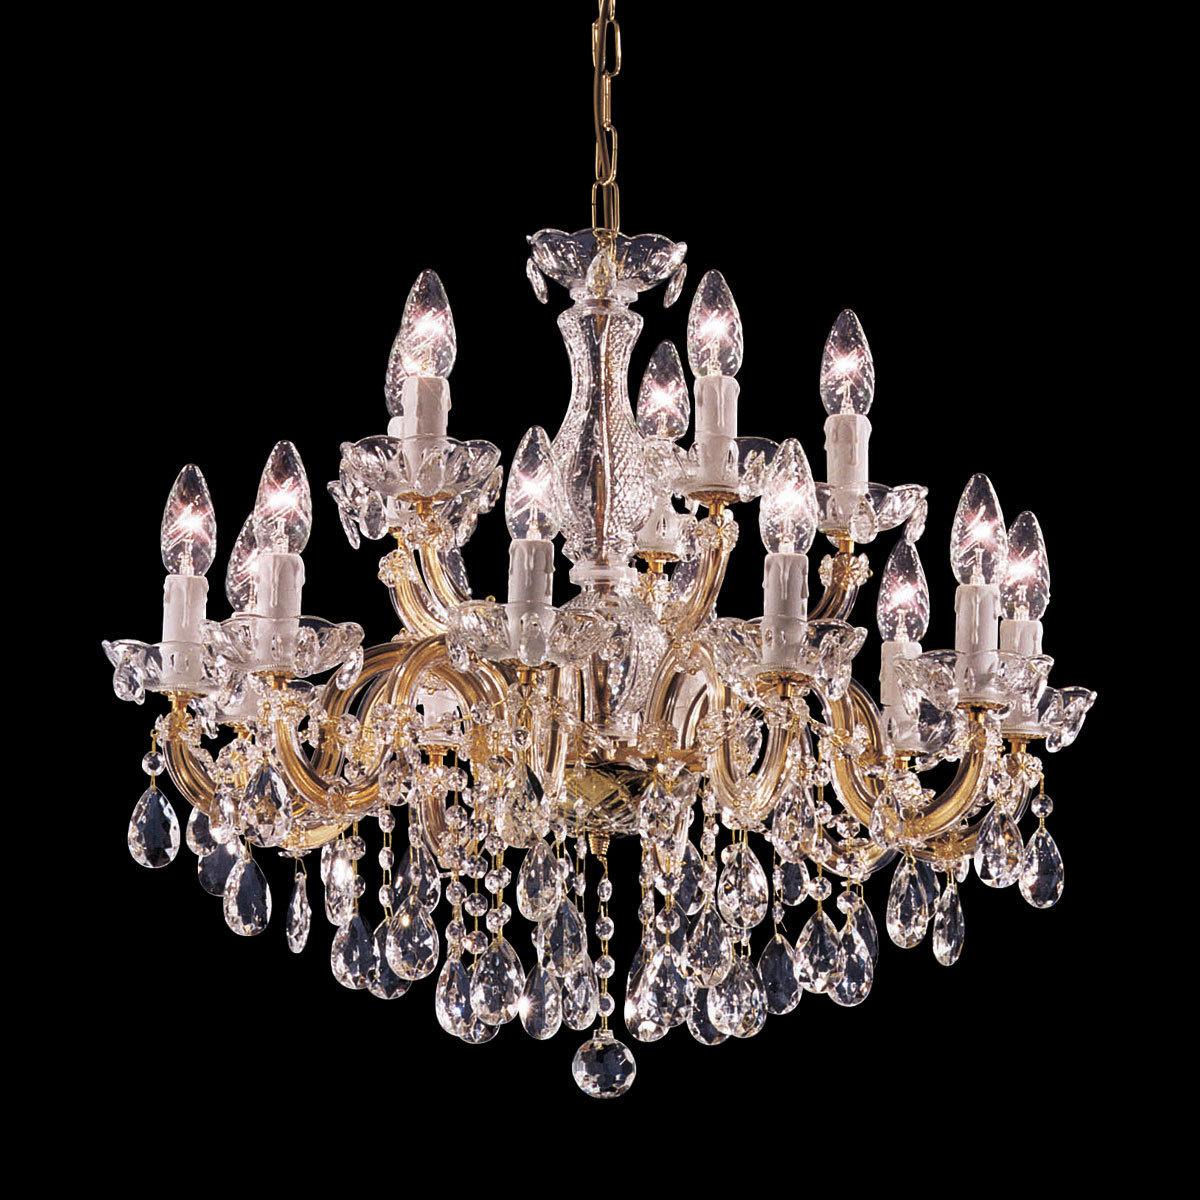 Chandelier Valerie Brass 216 75 15 Lights Brass 216 75cm